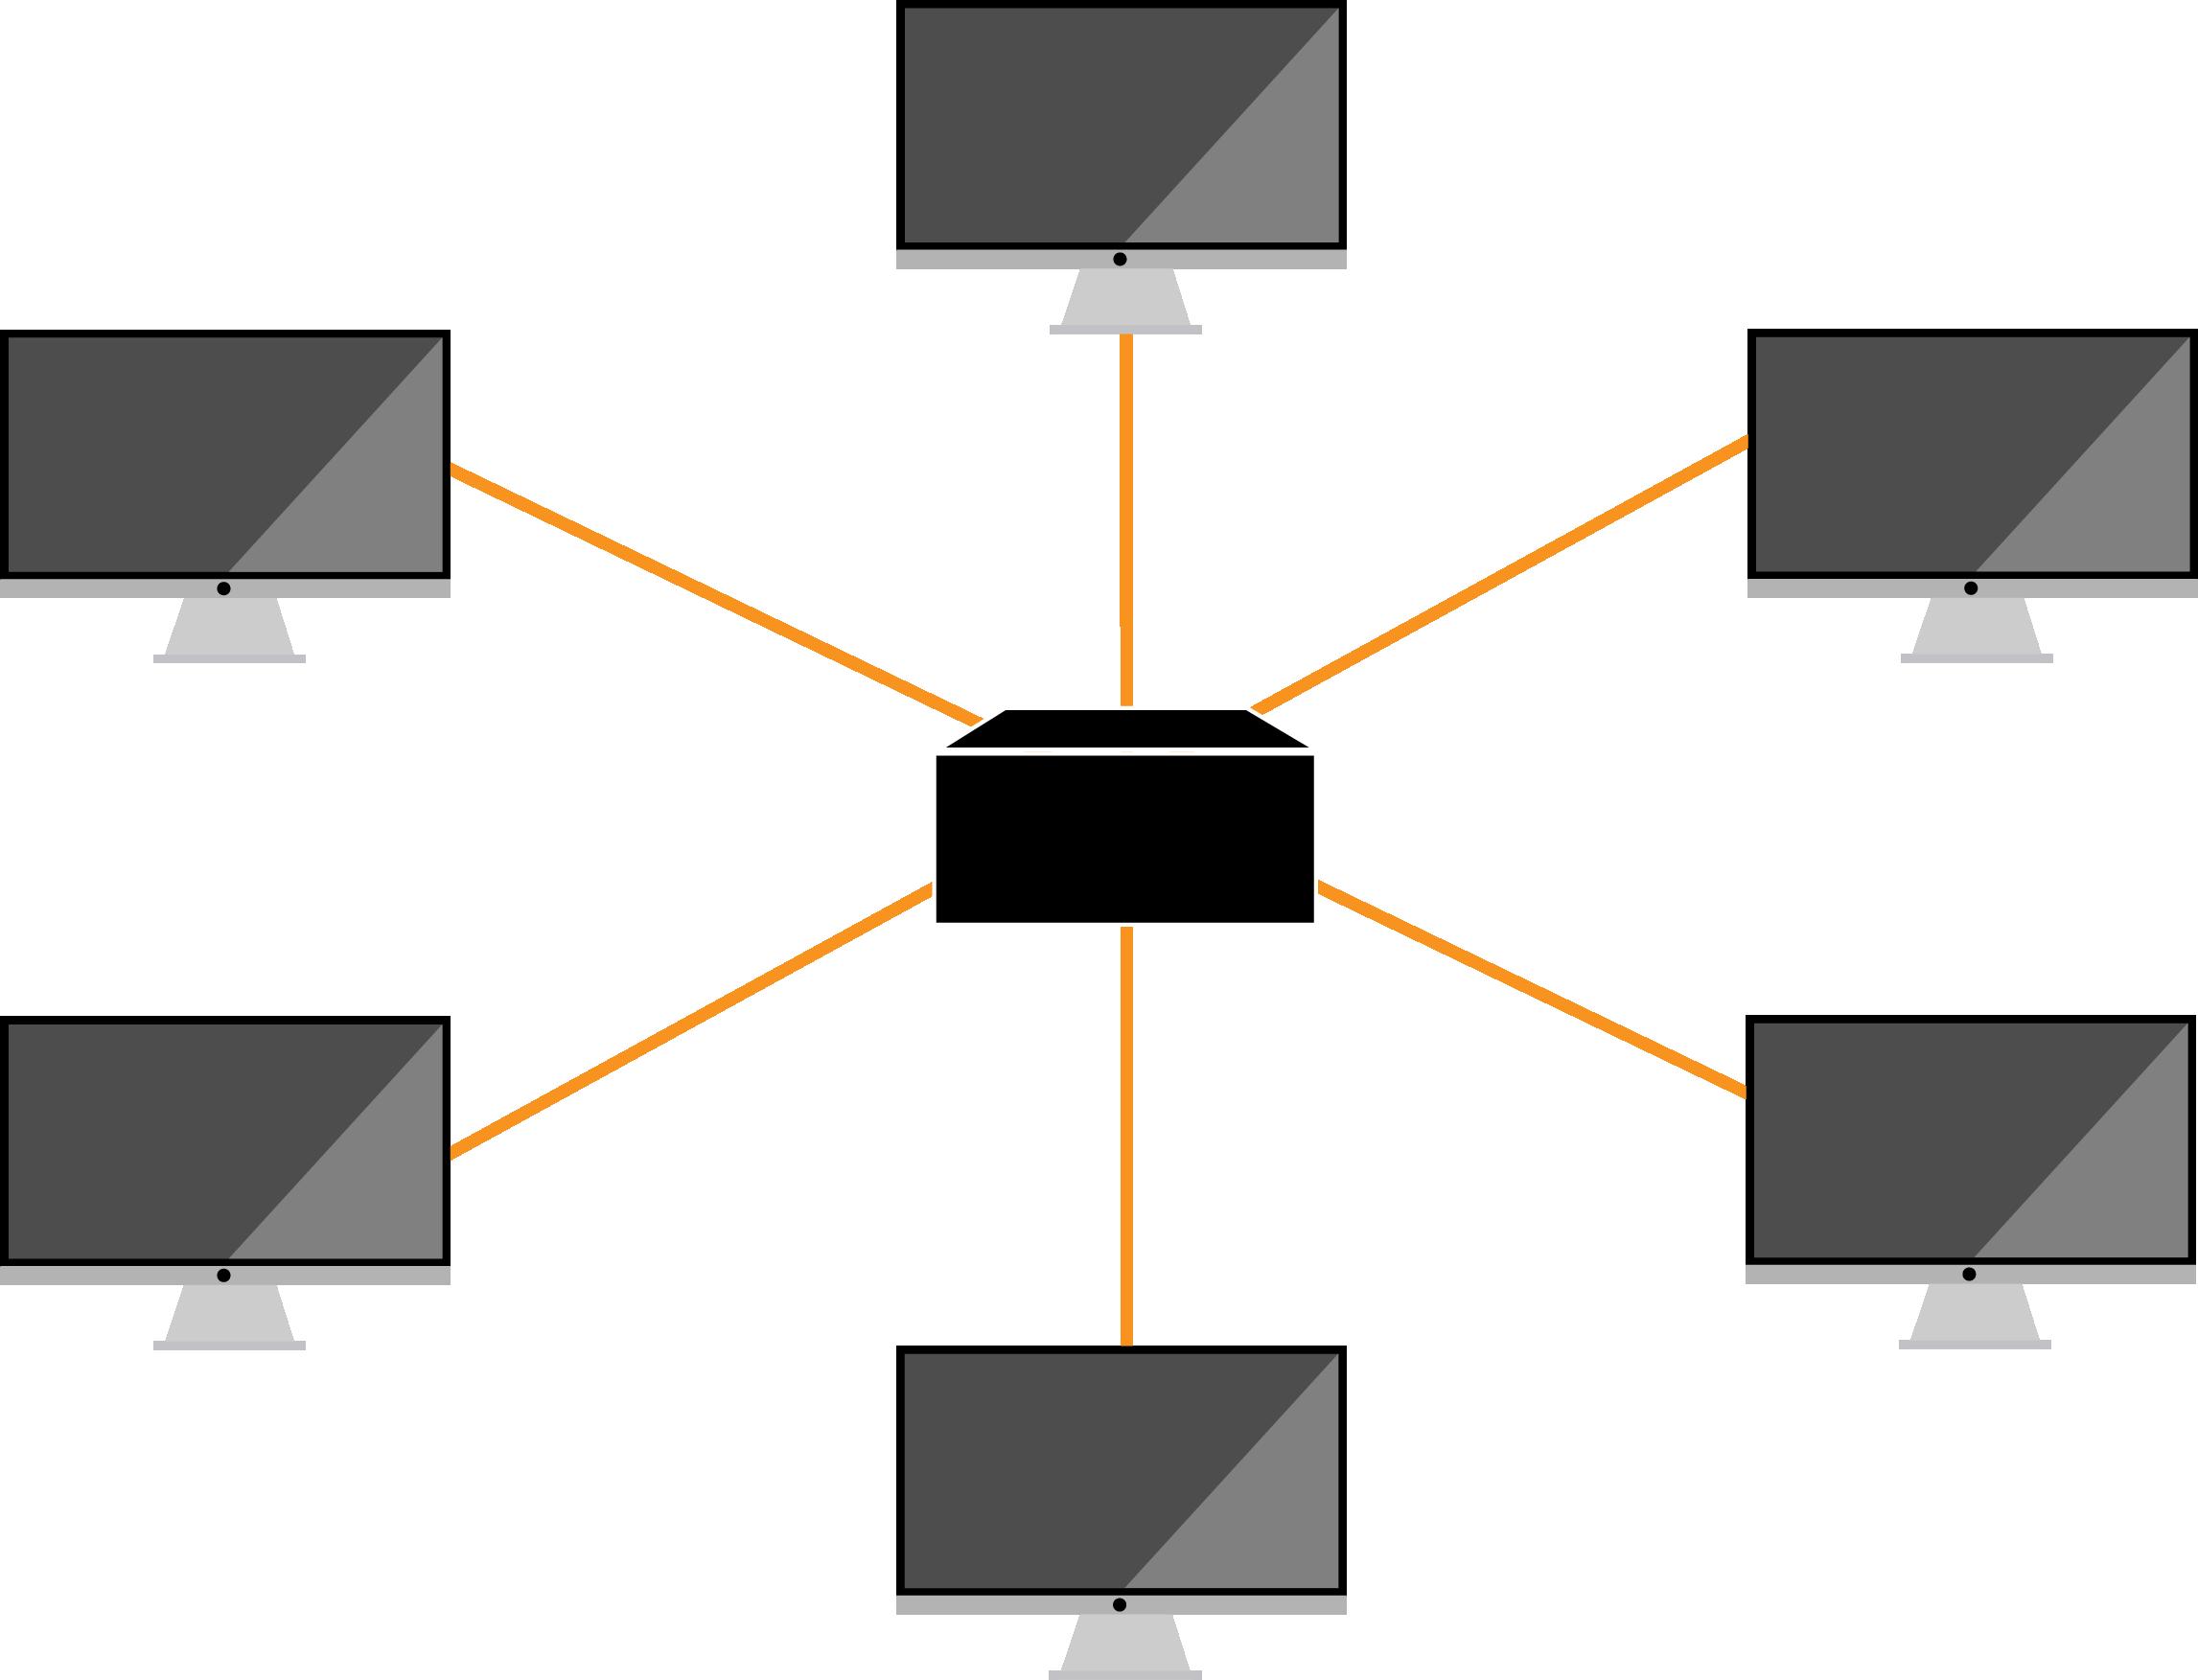 star_topology